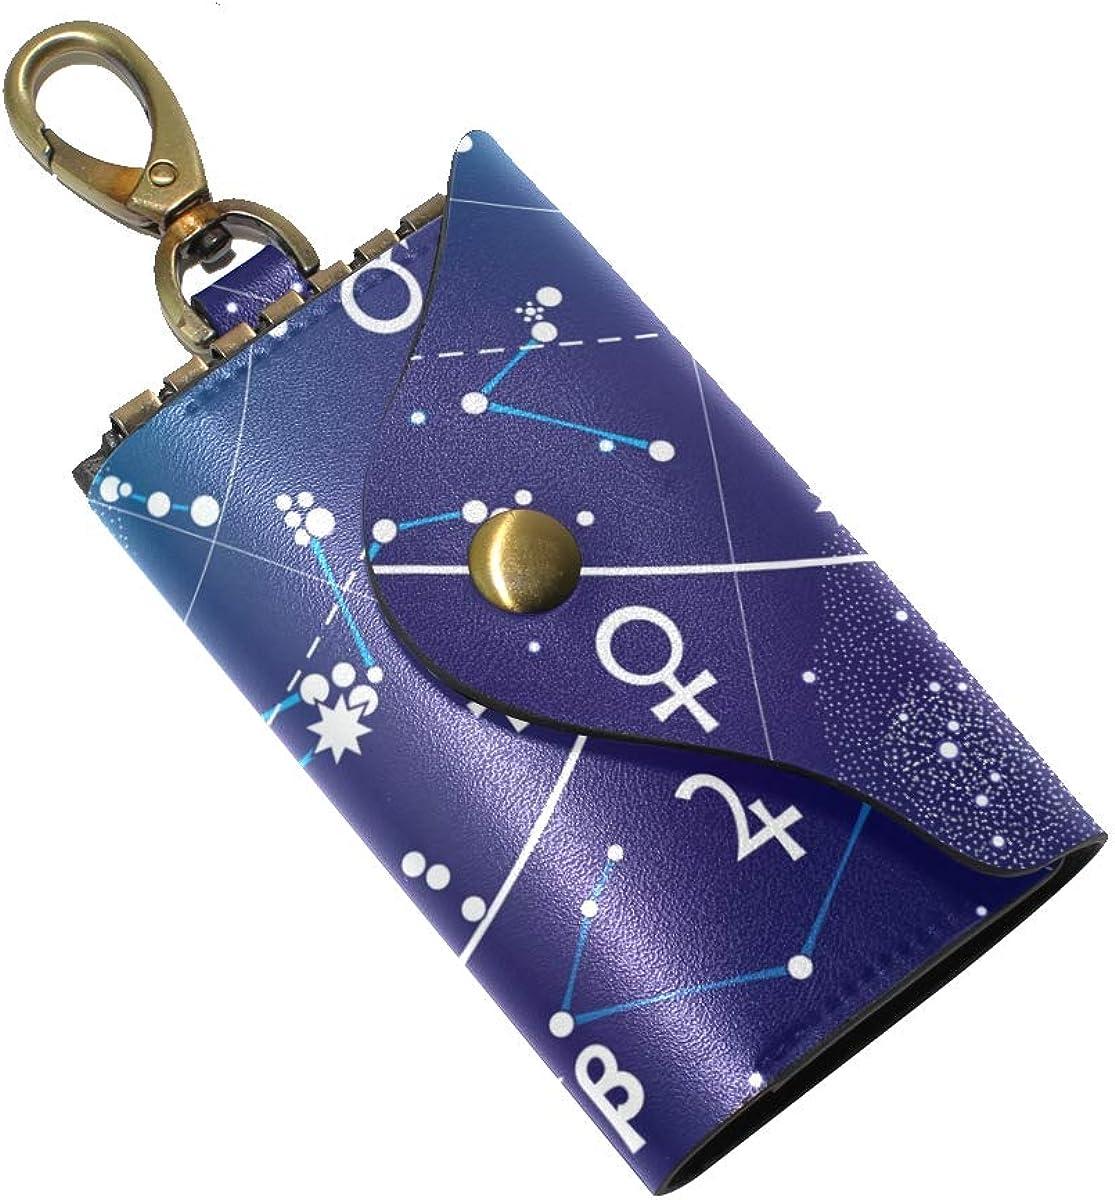 KEAKIA Fragment Of Astronomical Celestial Atlas Leather Key Case Wallets Tri-fold Key Holder Keychains with 6 Hooks 2 Slot Snap Closure for Men Women